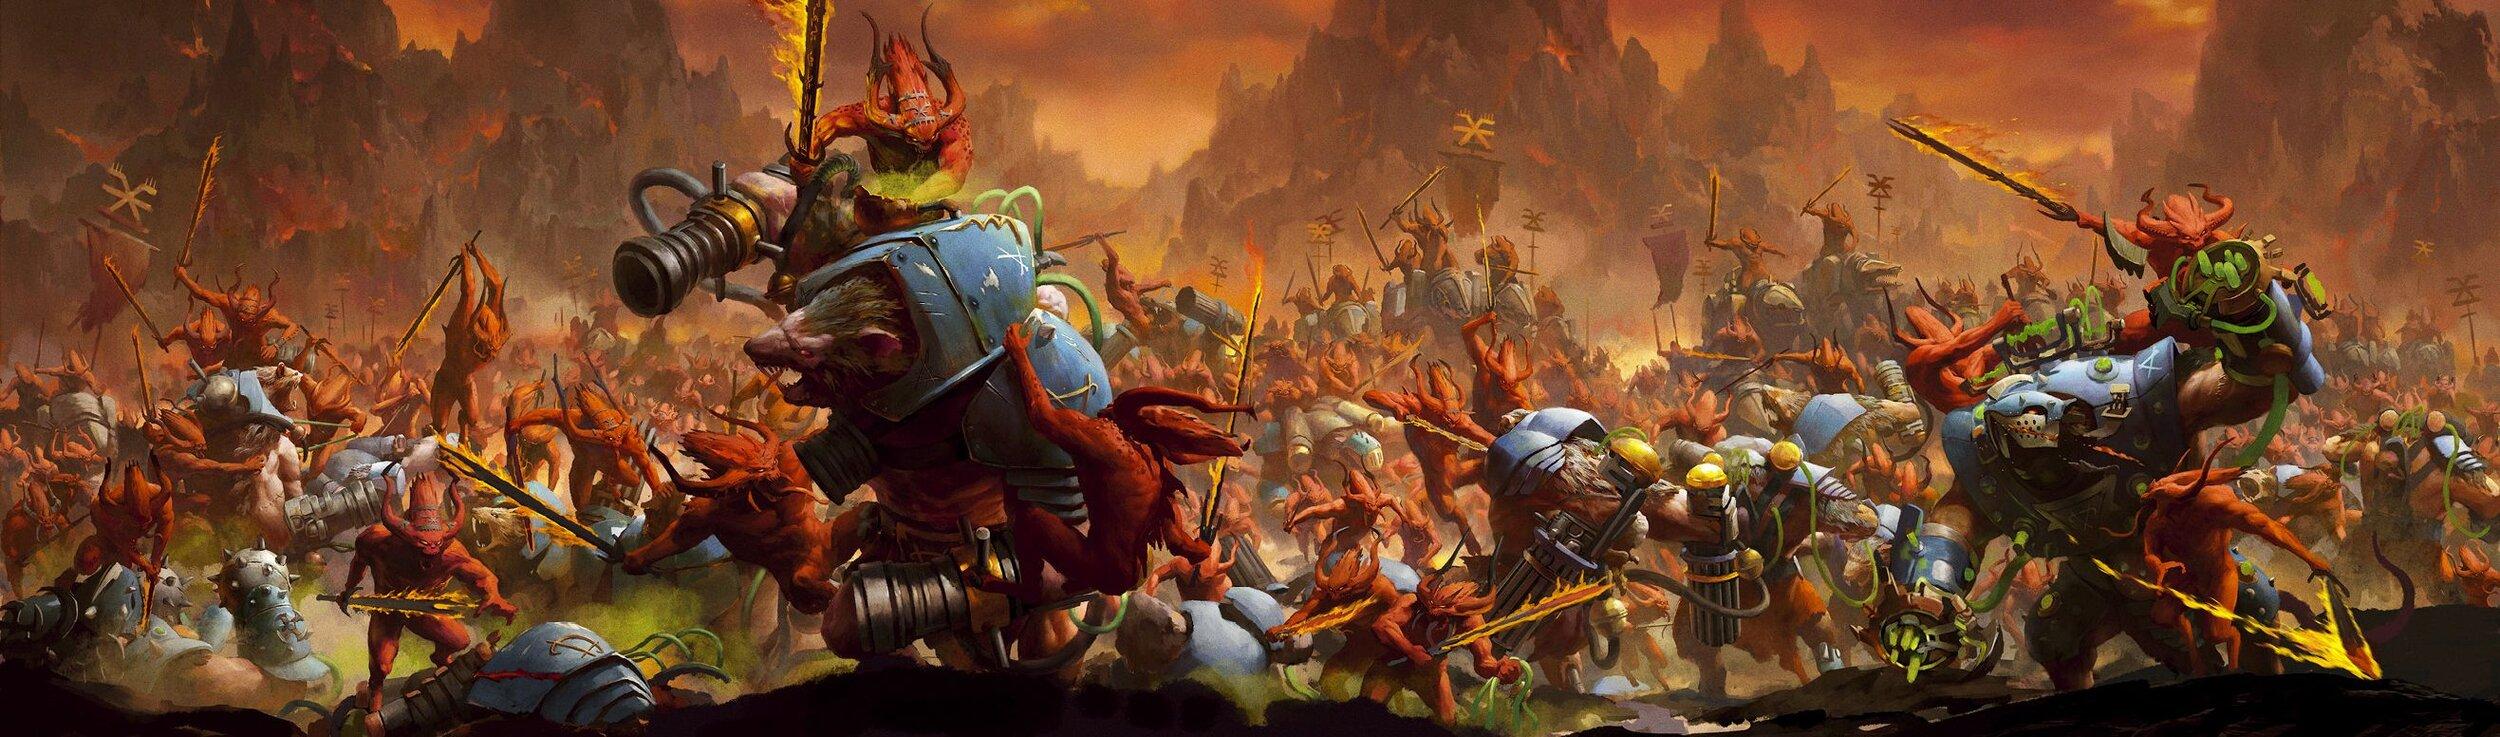 129-1293025_warhammer-age-of-sigmar-artwork-blades-of-khorne.jpg